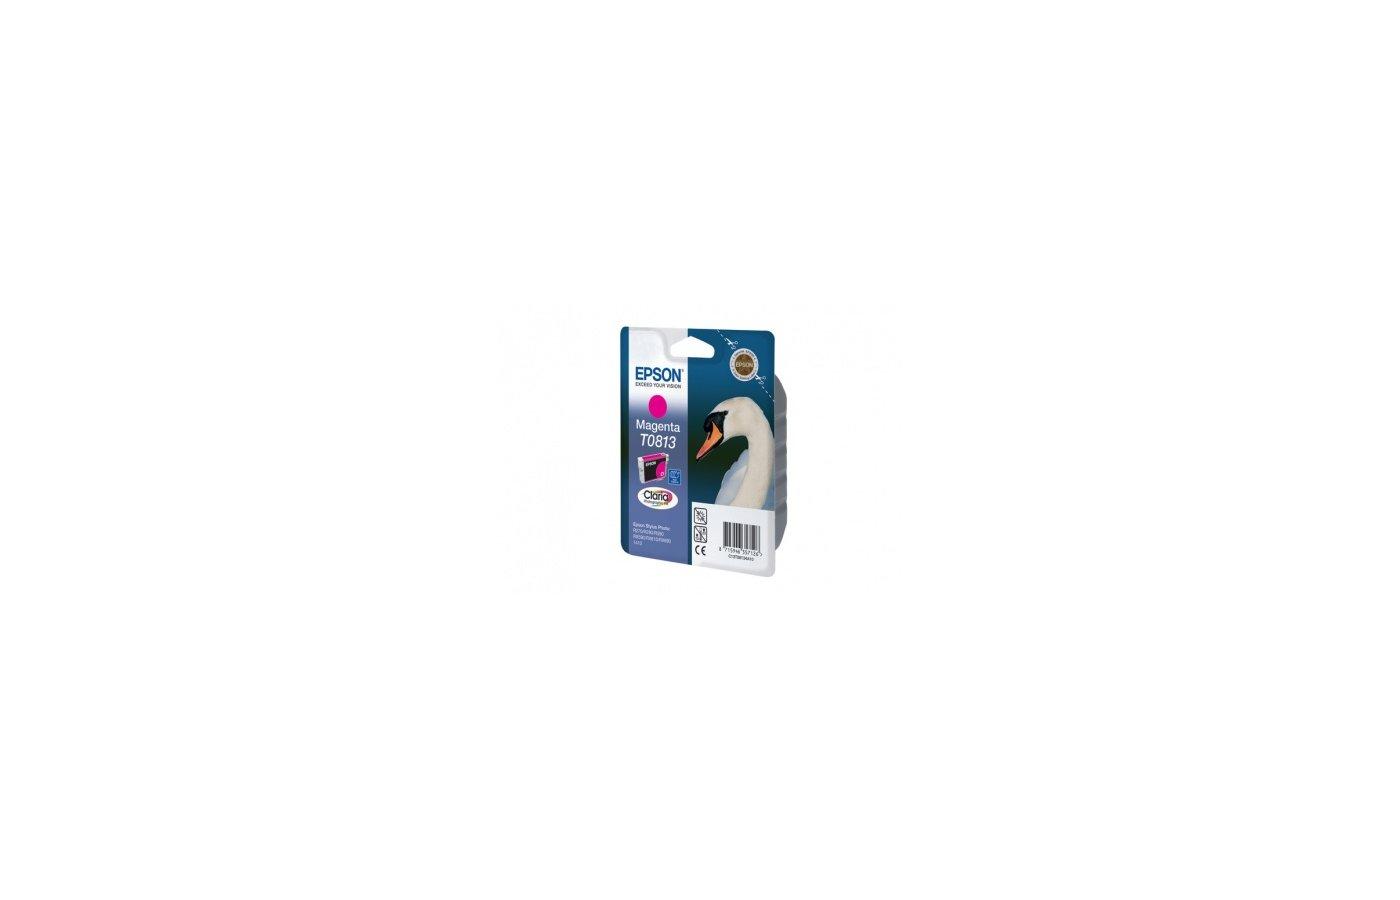 Картридж струйный Epson C13T11134A10 T0813 пурпурный R270/290/RX590 (замена C13T08134A)